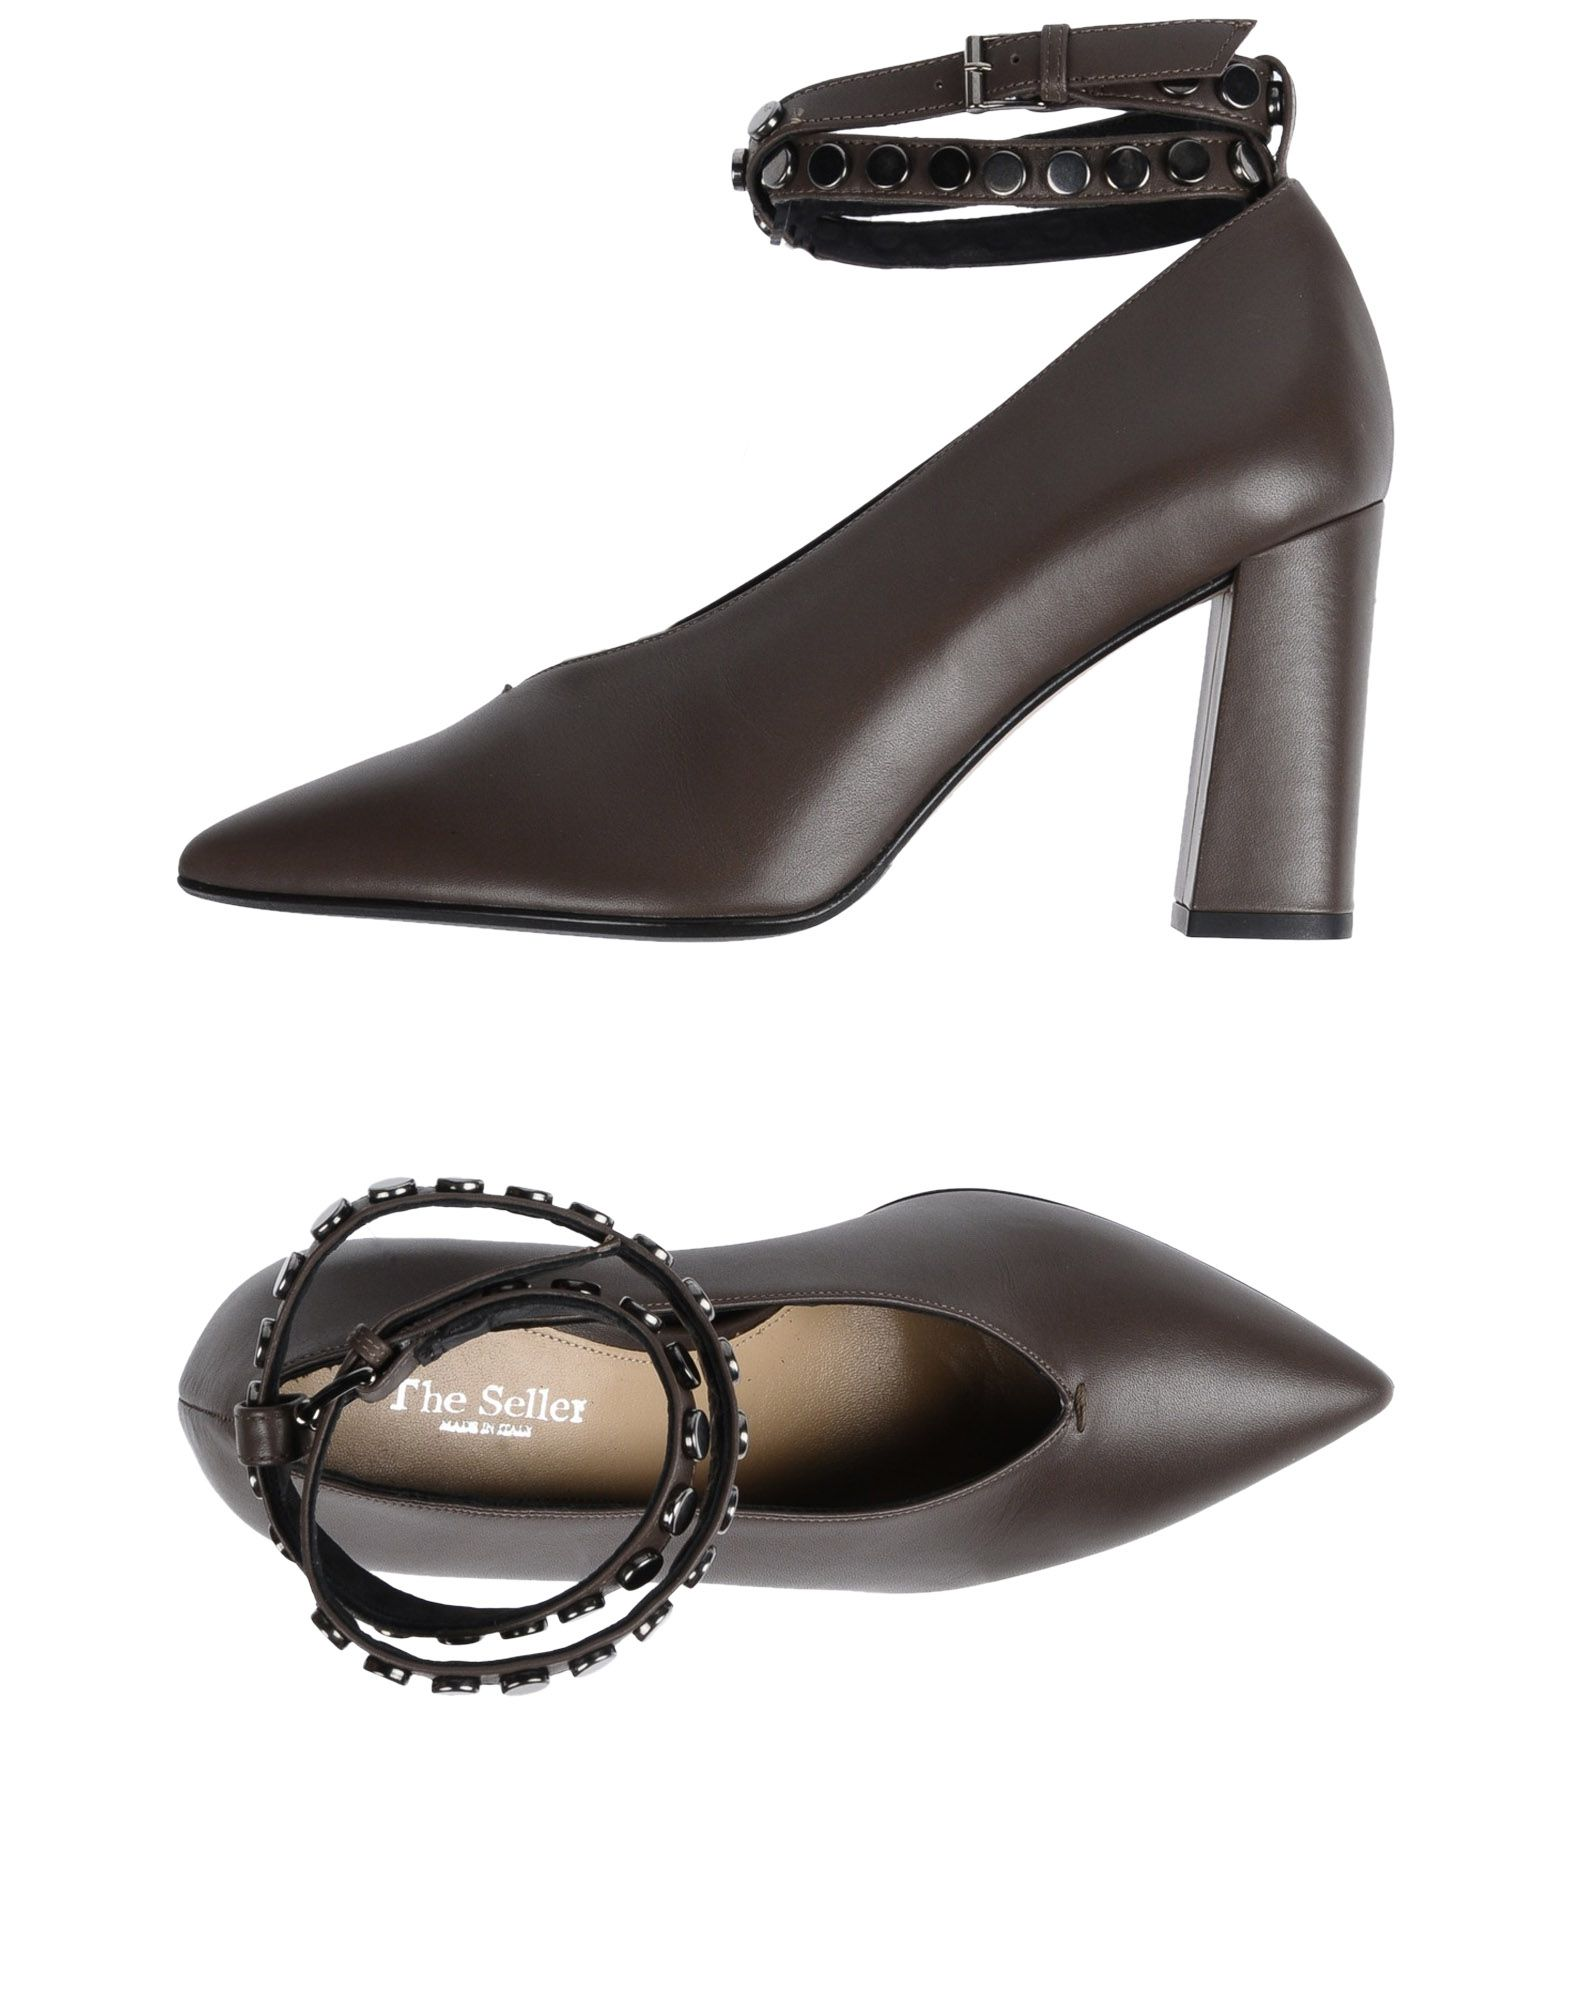 Stilvolle billige Schuhe The Seller Pumps Damen  11508037DC